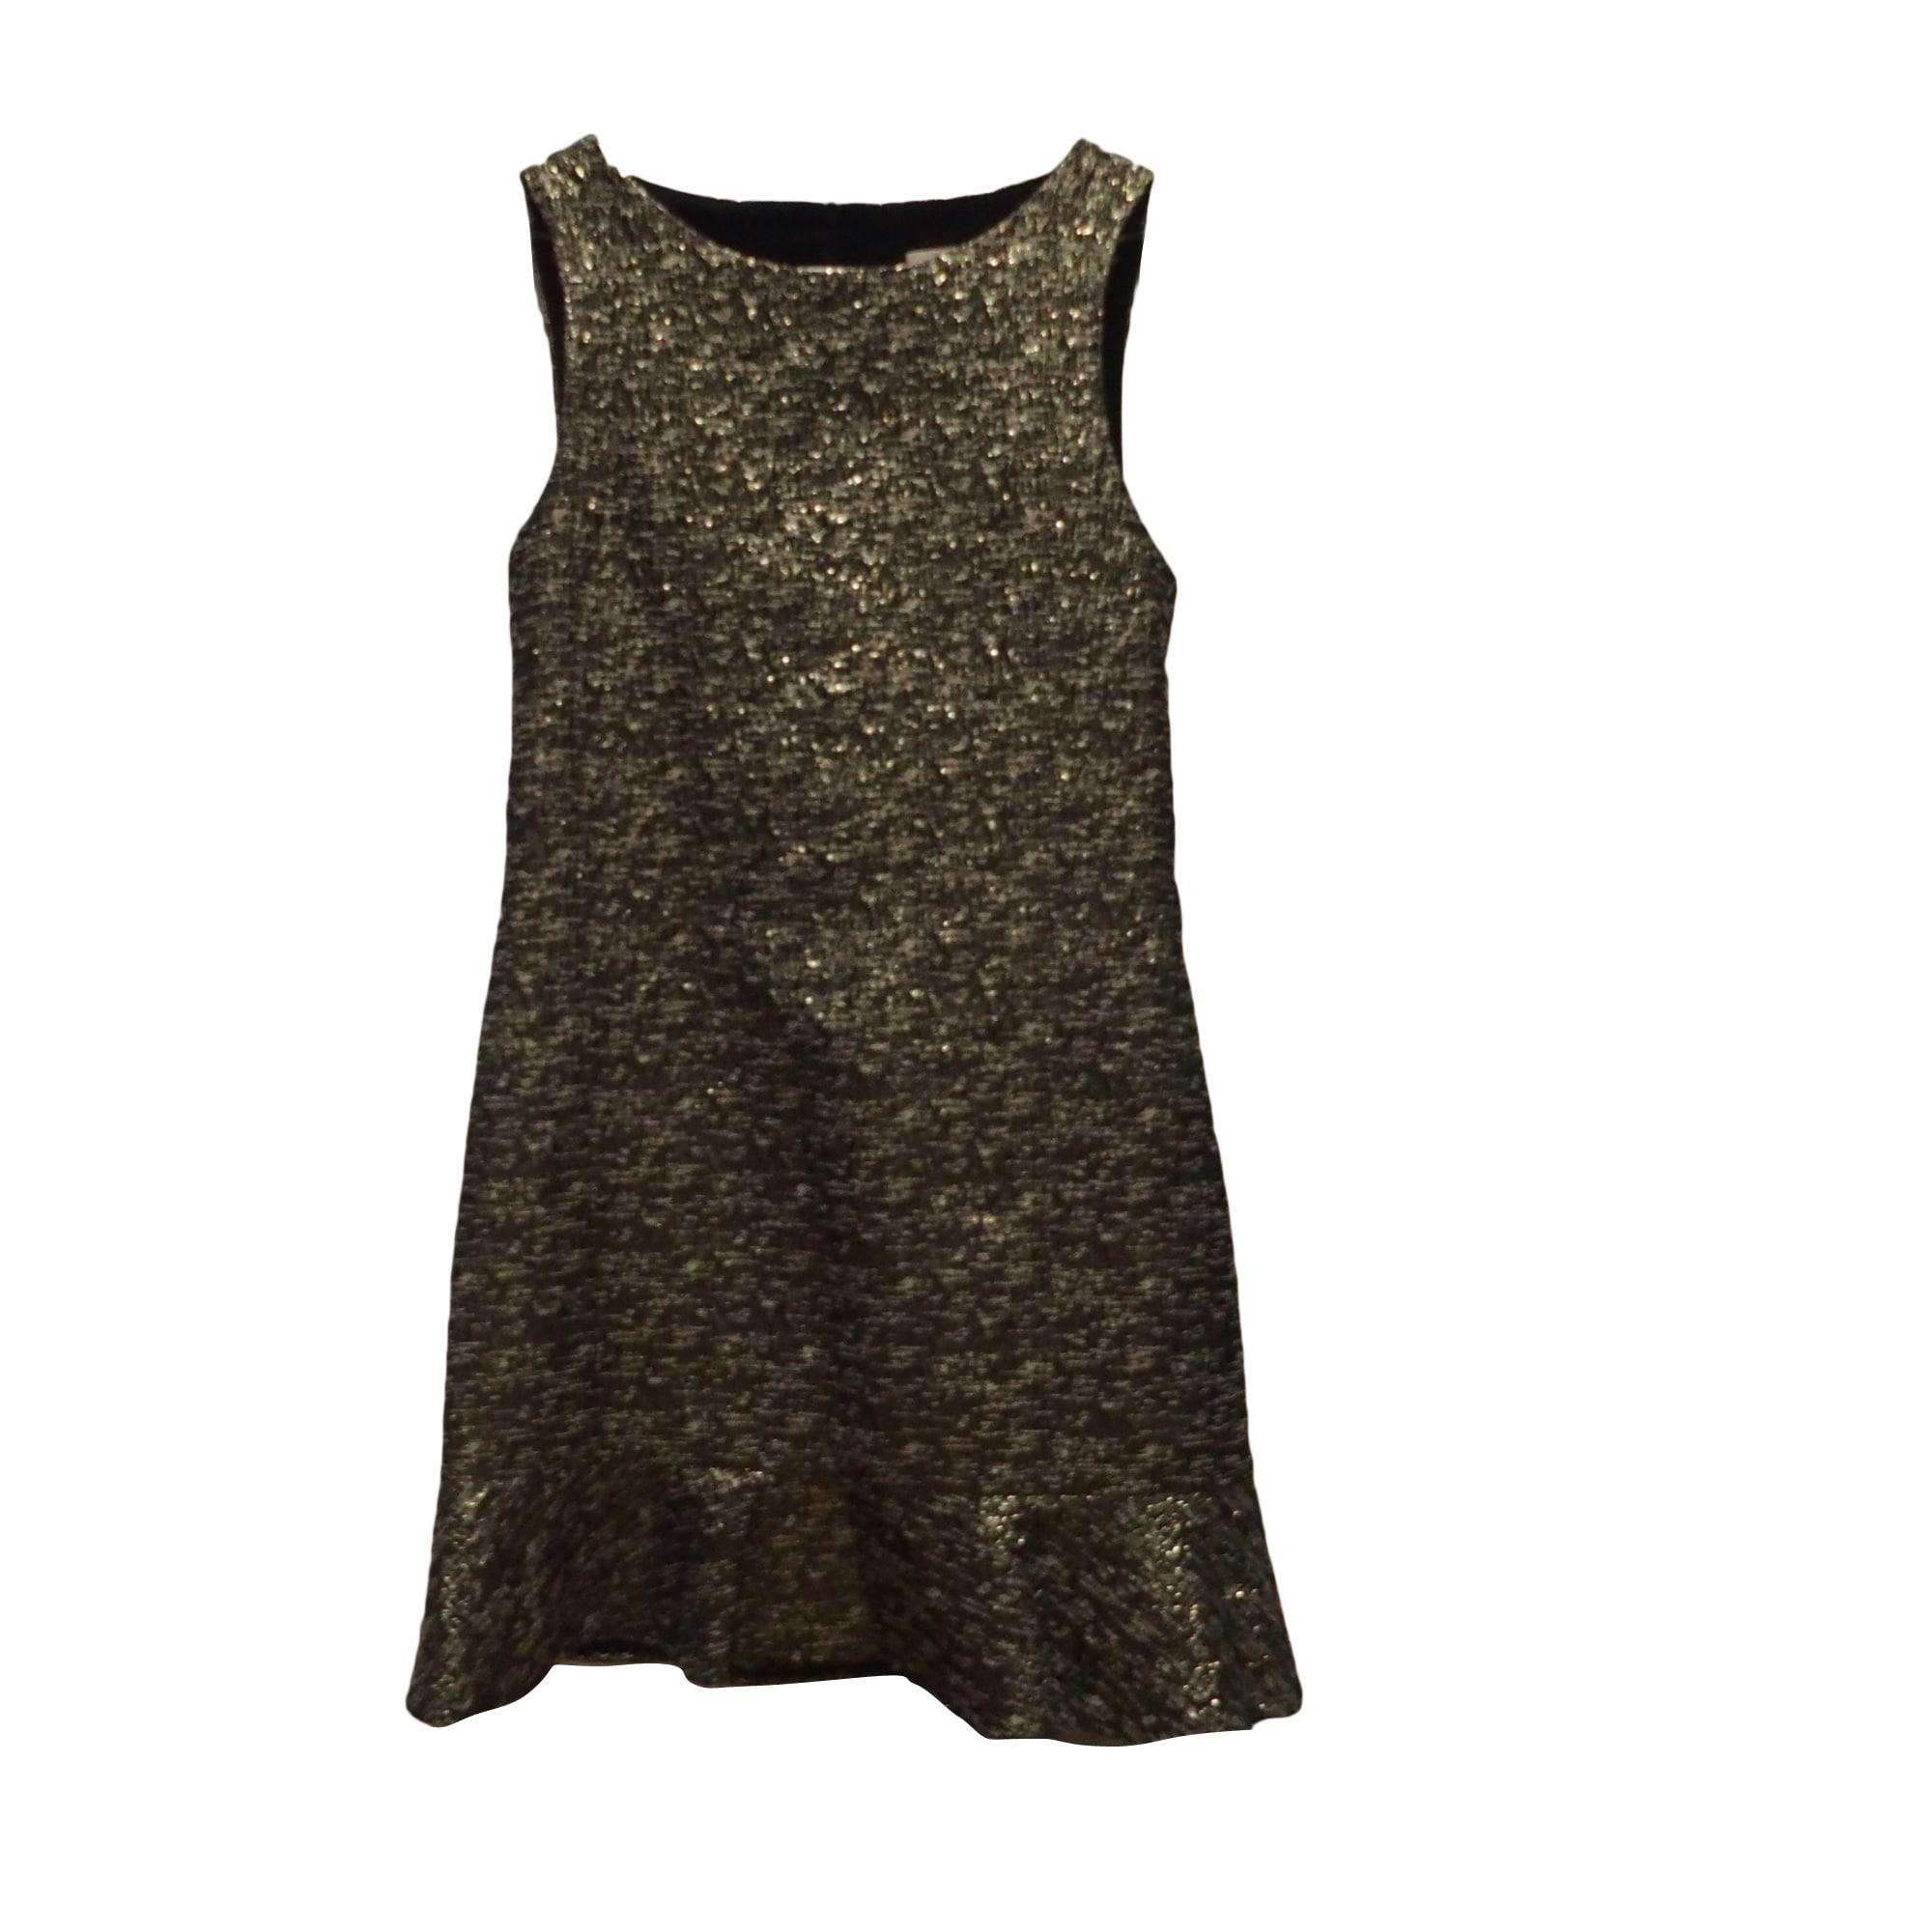 Robe courte BA&SH Doré, bronze, cuivre